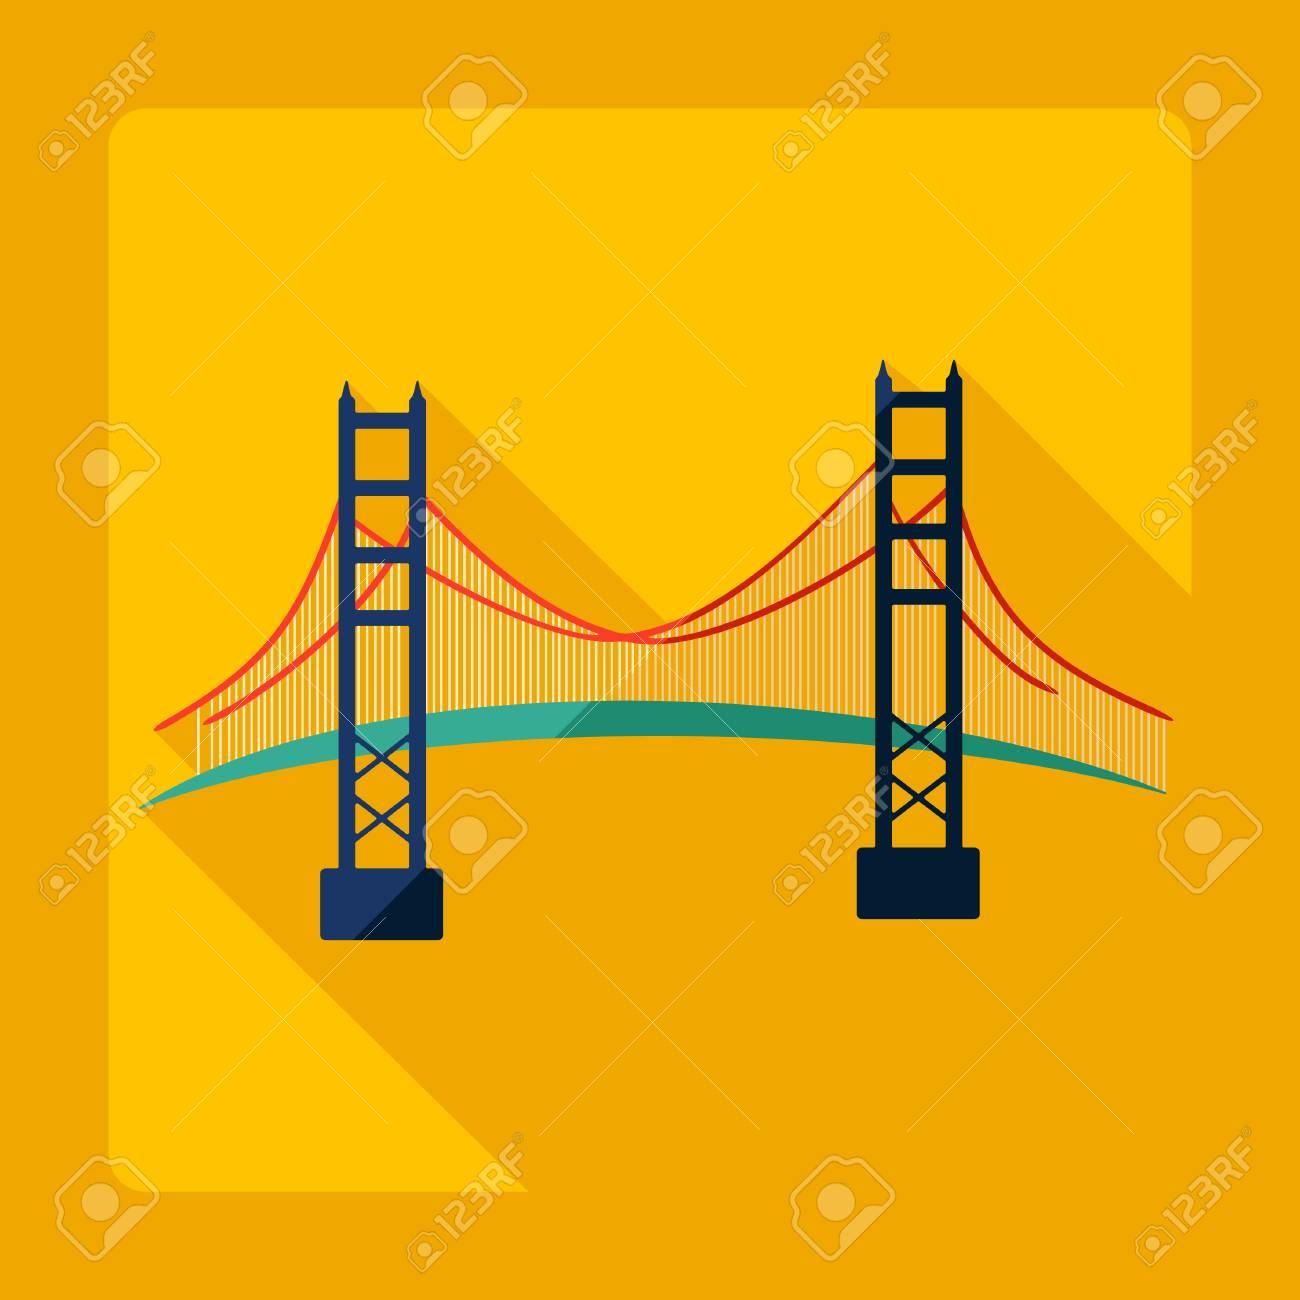 Flat modern design with shadow San Francisco Golden Gate bridge - 53037772